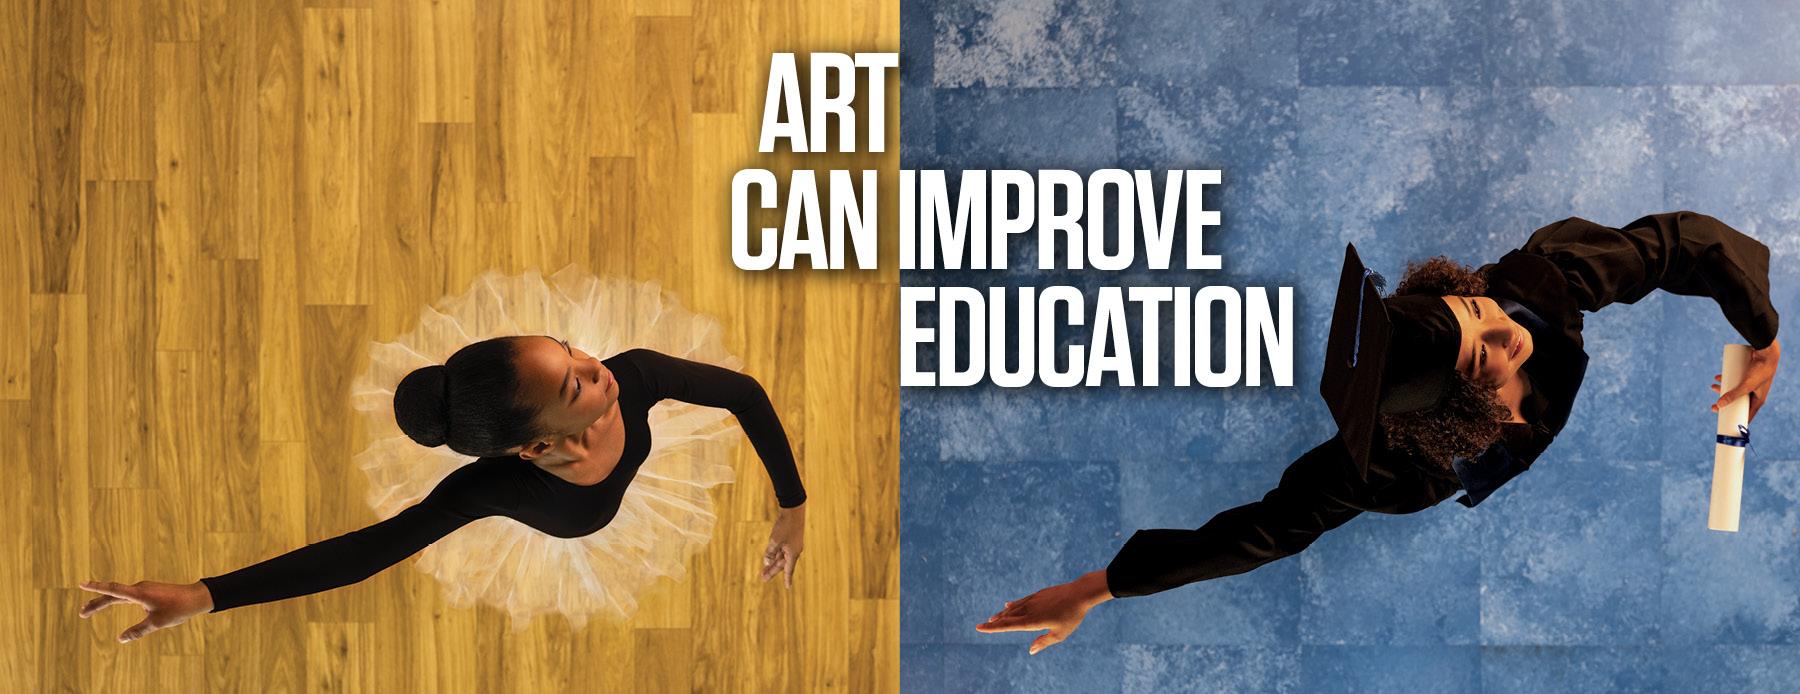 Art Can Improve Education